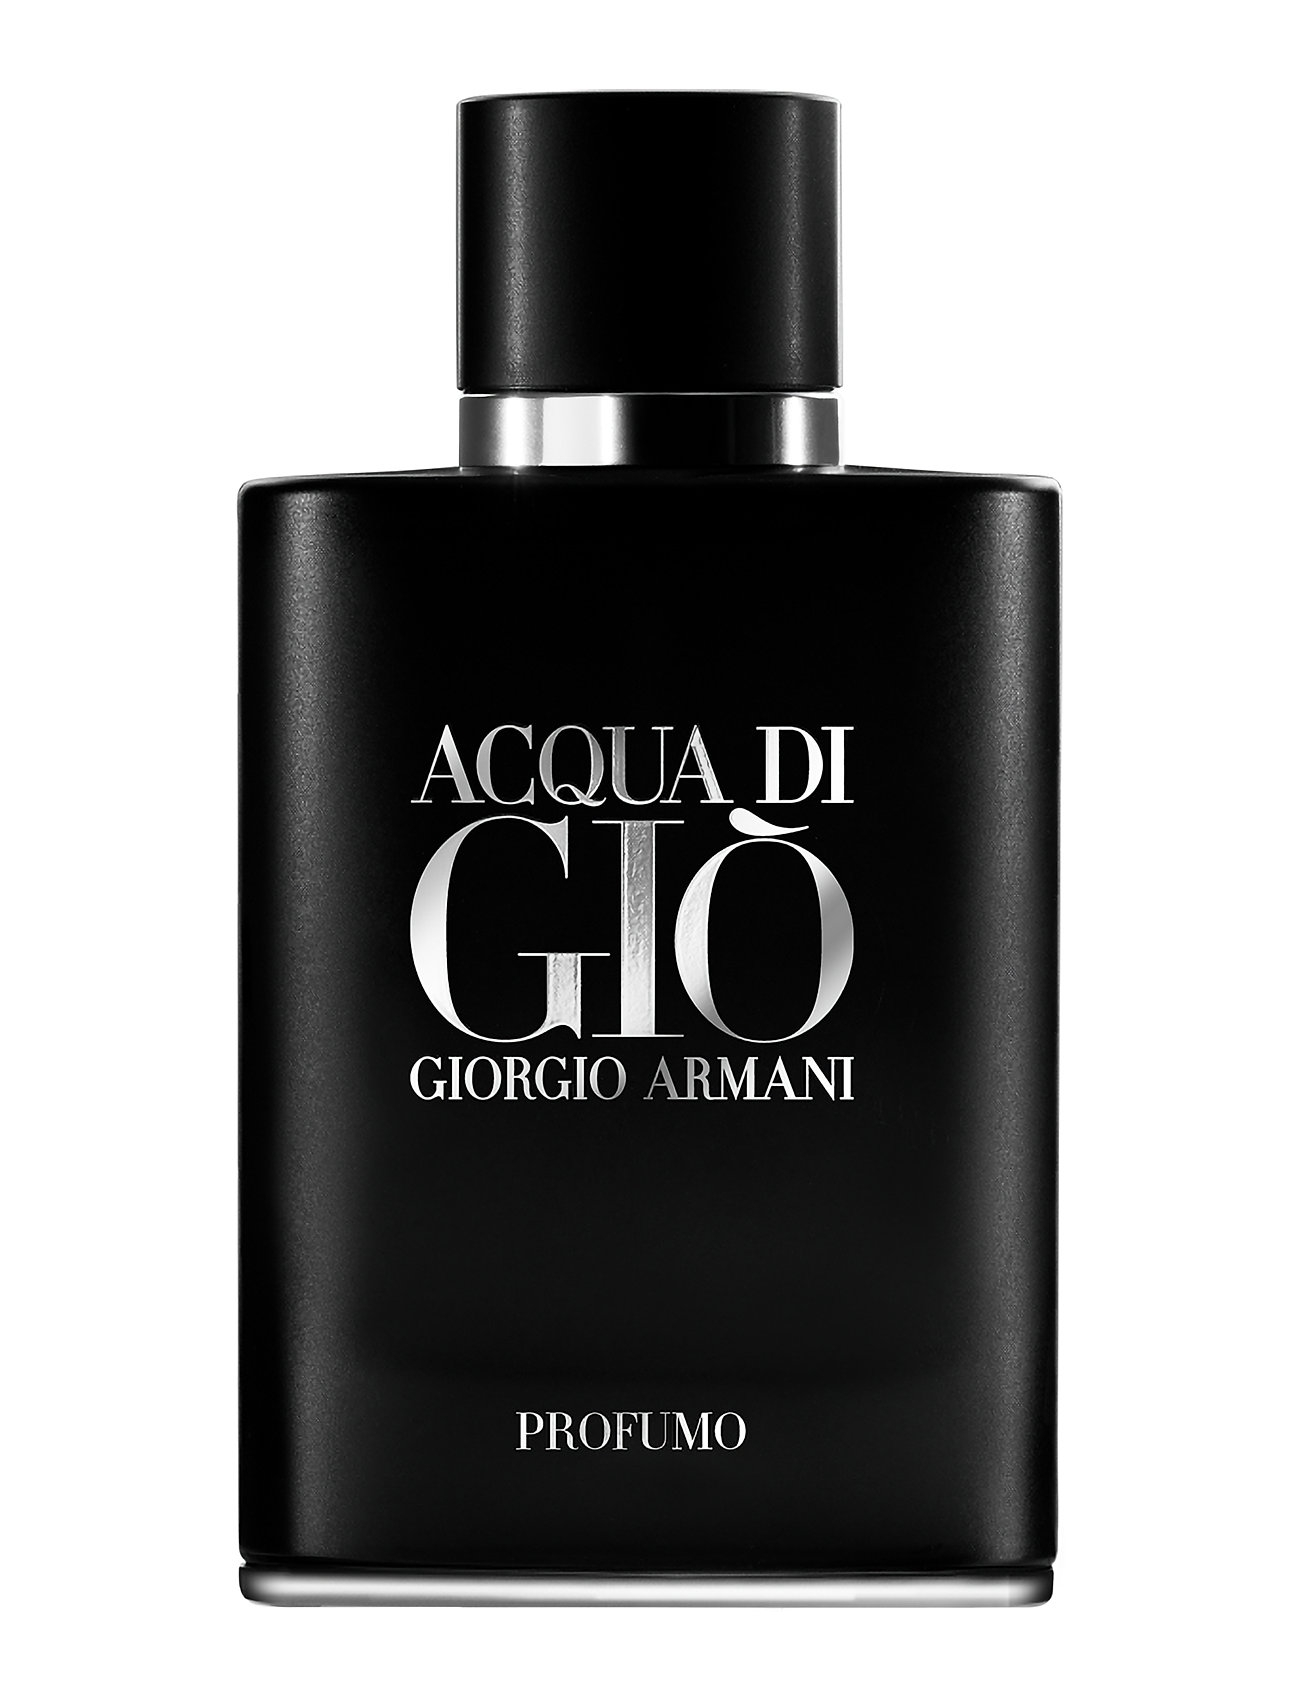 Acqua di giã² profumo 75 ml fra giorgio armani fra boozt.com dk